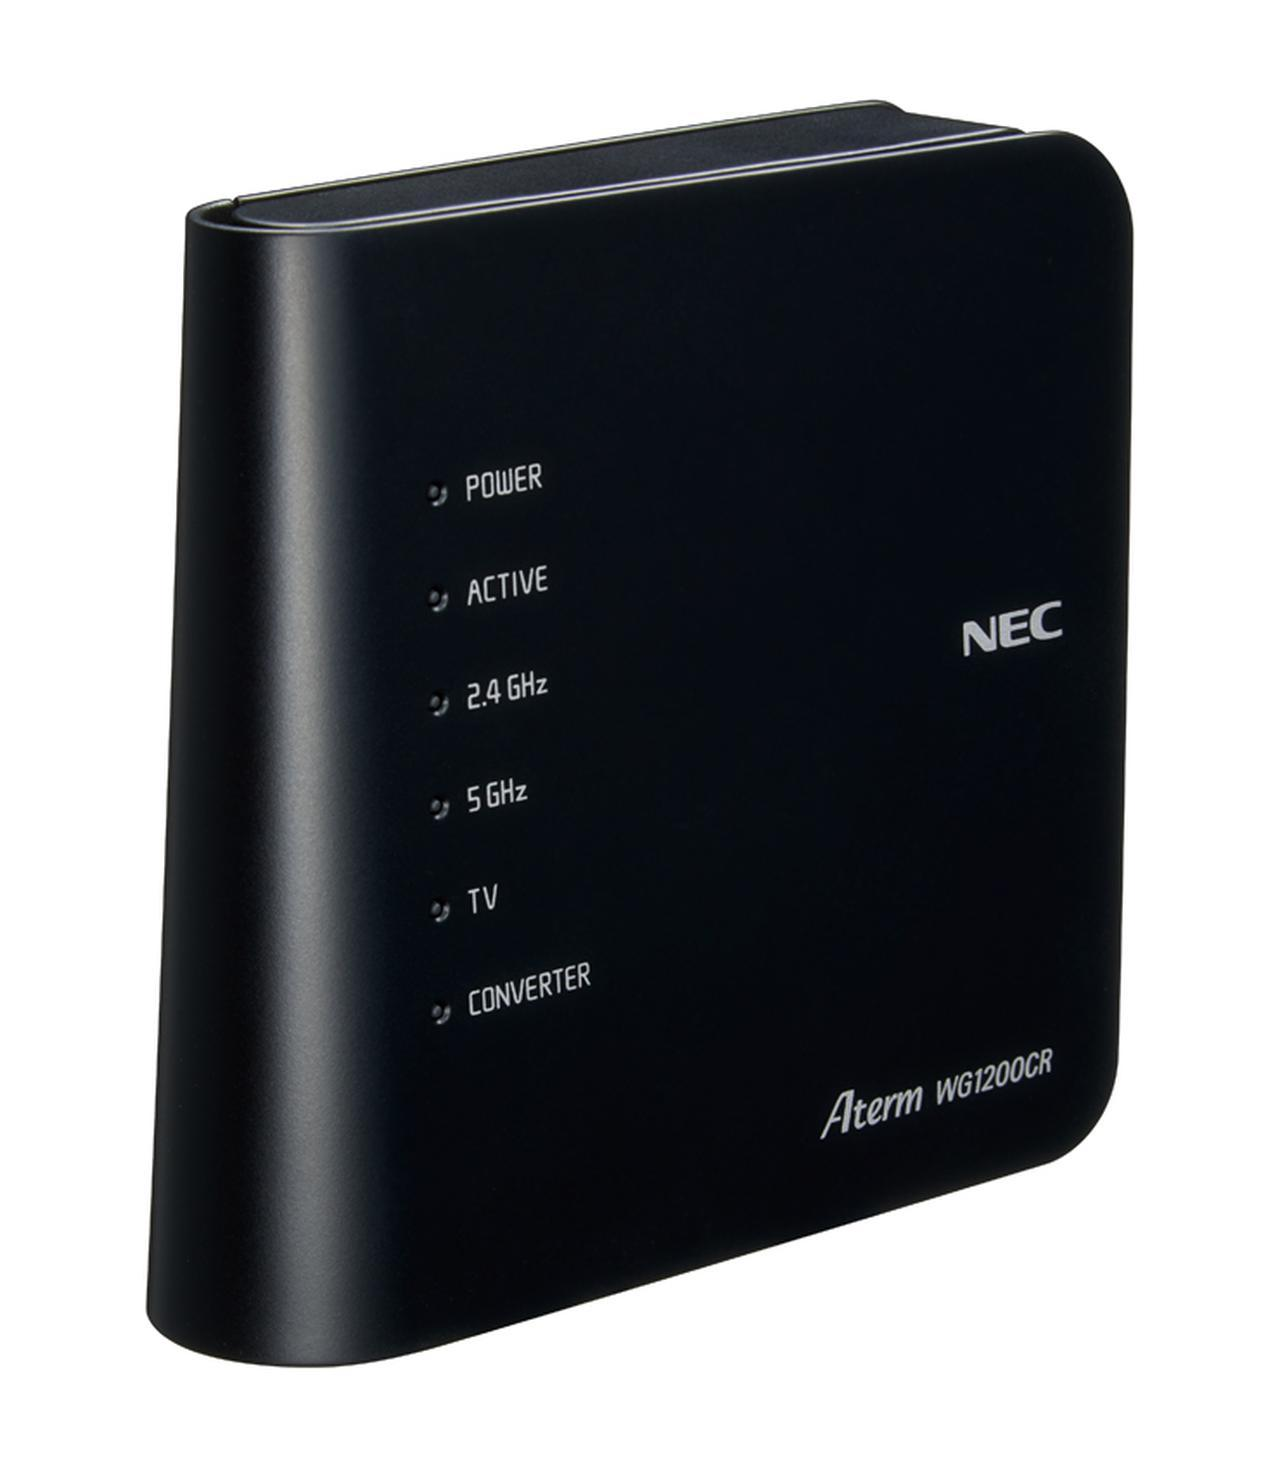 画像: NEC Aterm WG1200CR